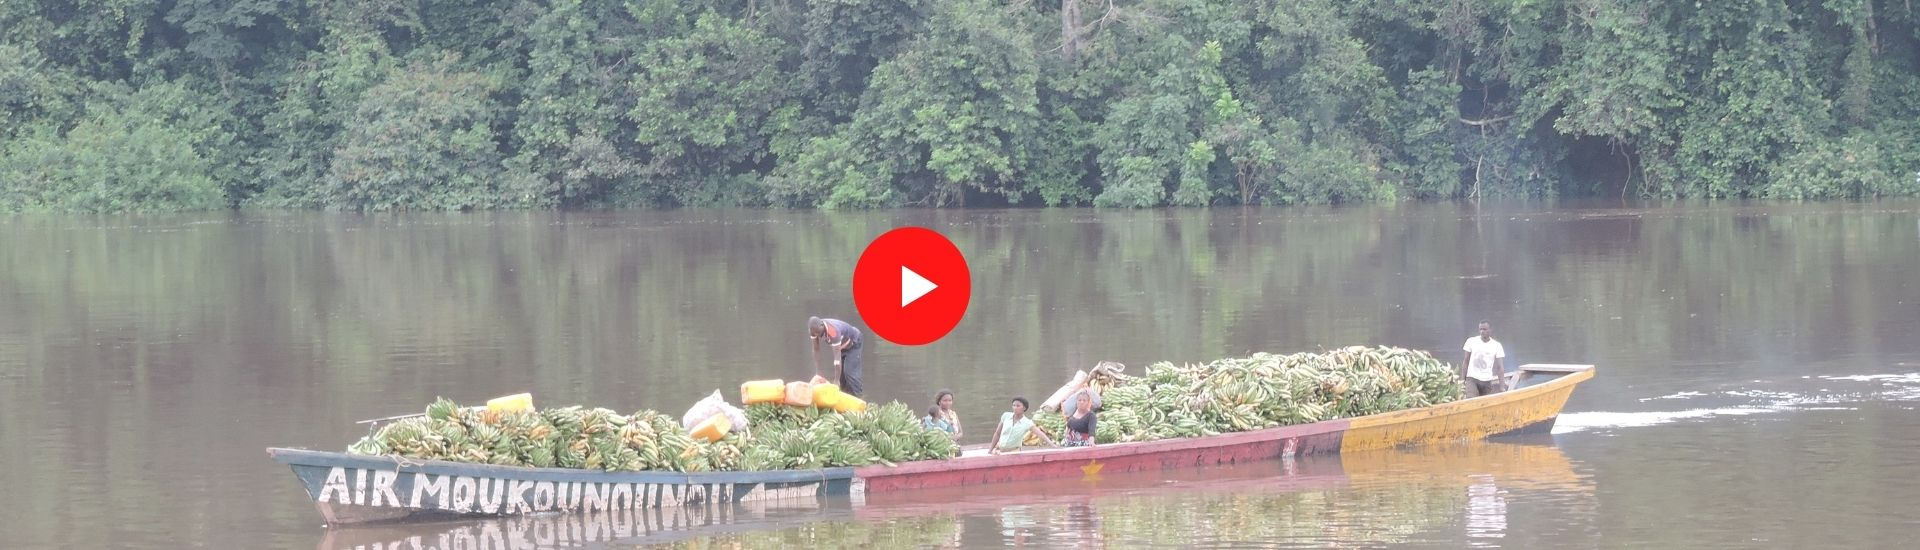 Escapade sur le fleuve Ngoko (Cameroun) - Minsili ZANGA